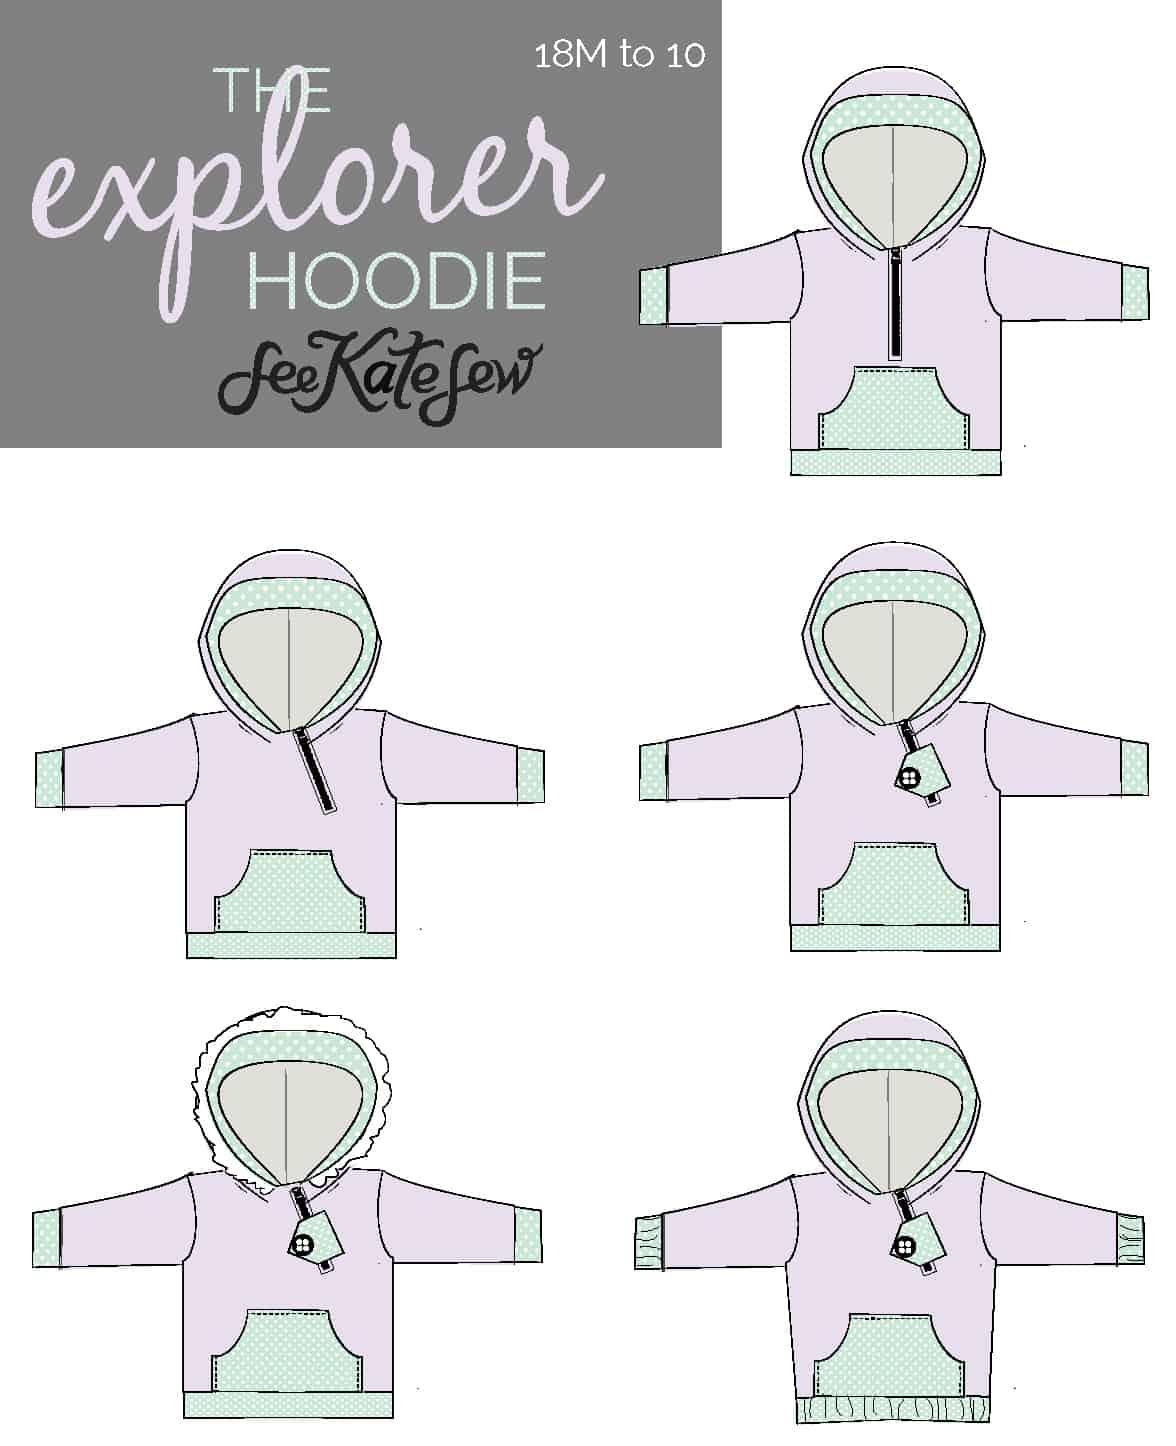 explorer-hoodie-picture